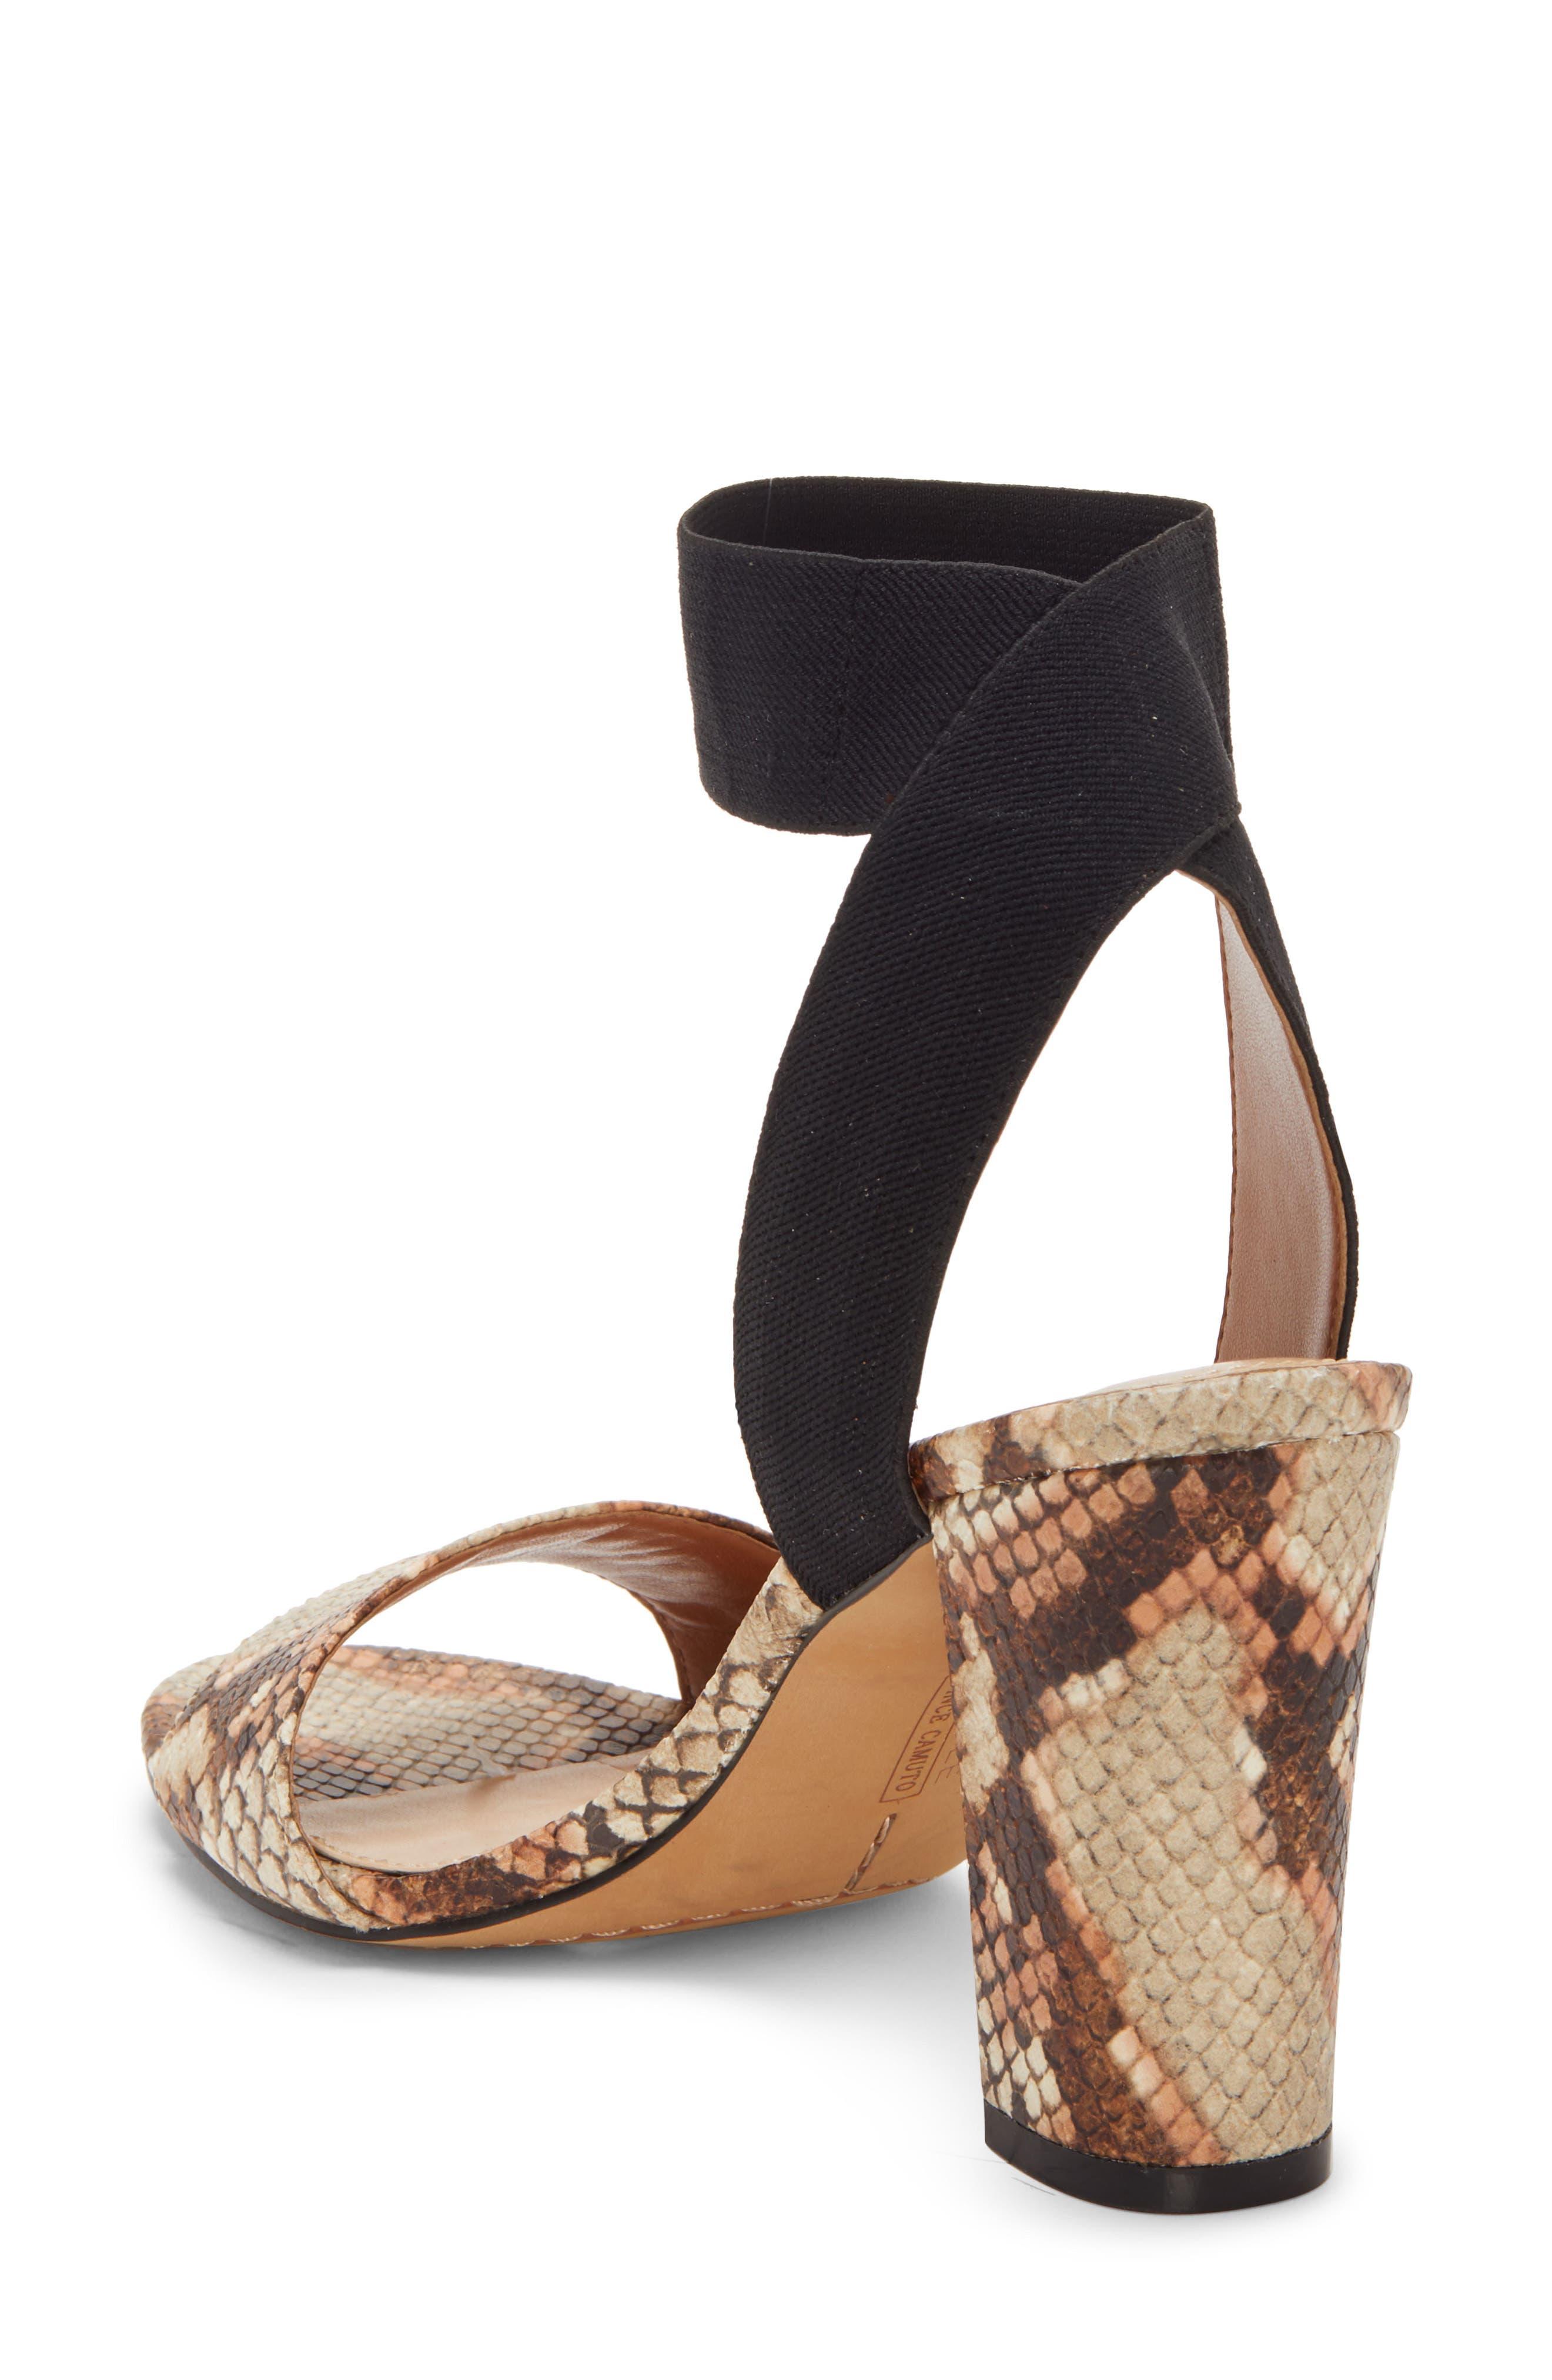 a956ab997 Women s Shoes New Arrivals  Boots